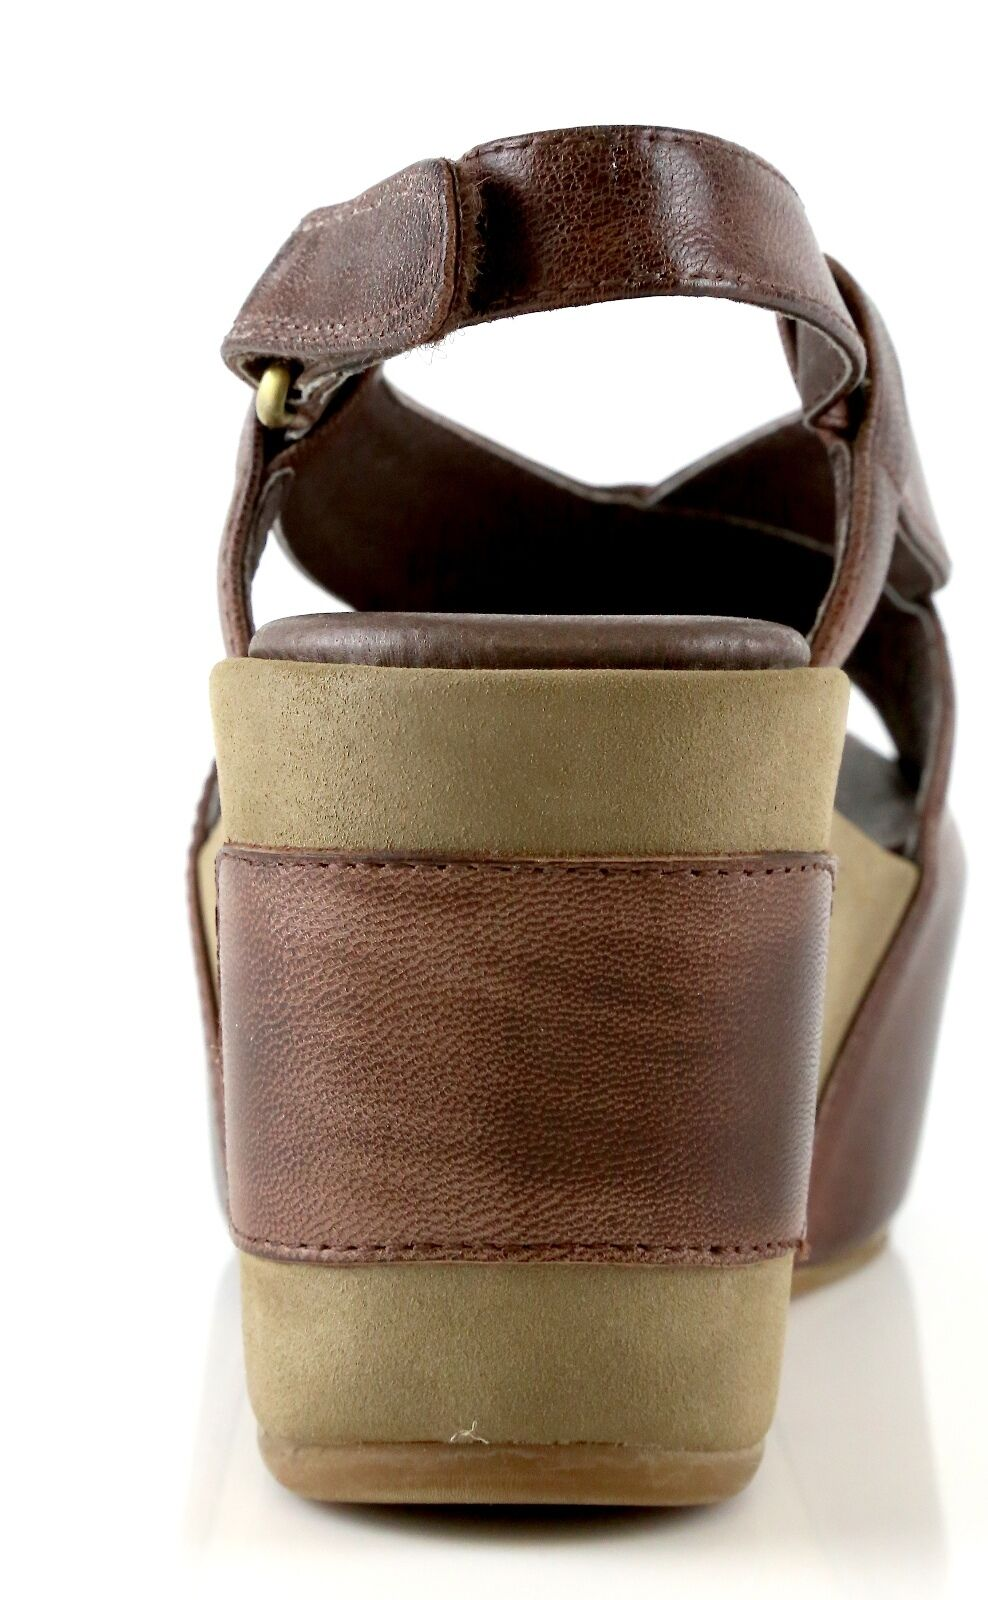 Antelope braun 810 braun Antelope Leather Ankle Strap Wedge Sandals 7045 Größe 37 EU NEW bfb374